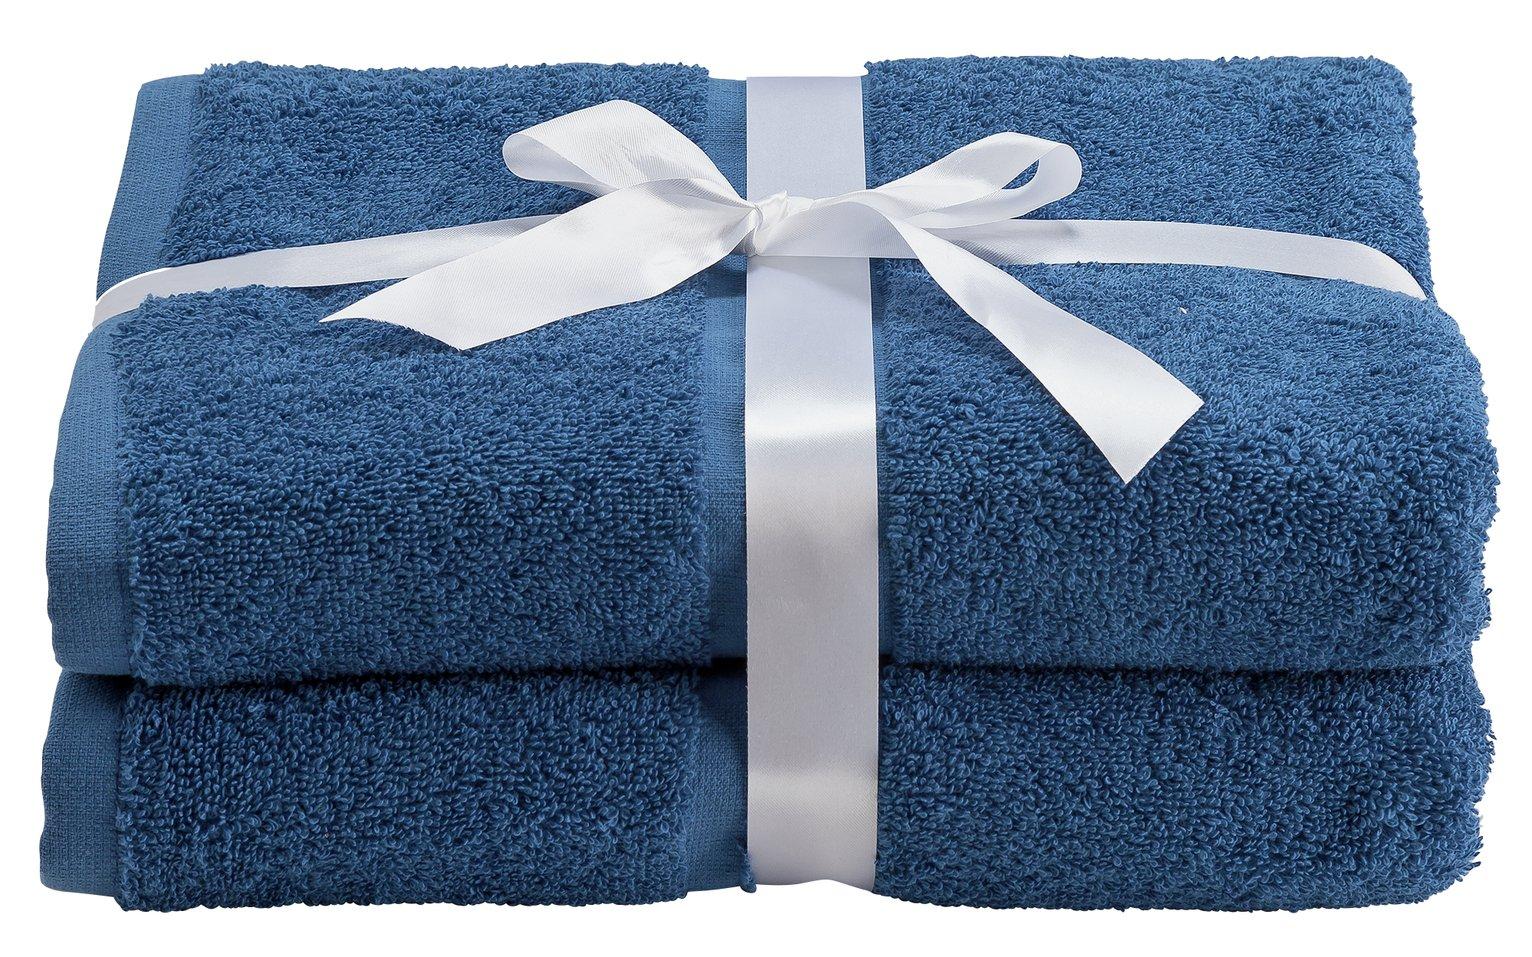 Argos Home Pair of Bath Towels - Ink Blue